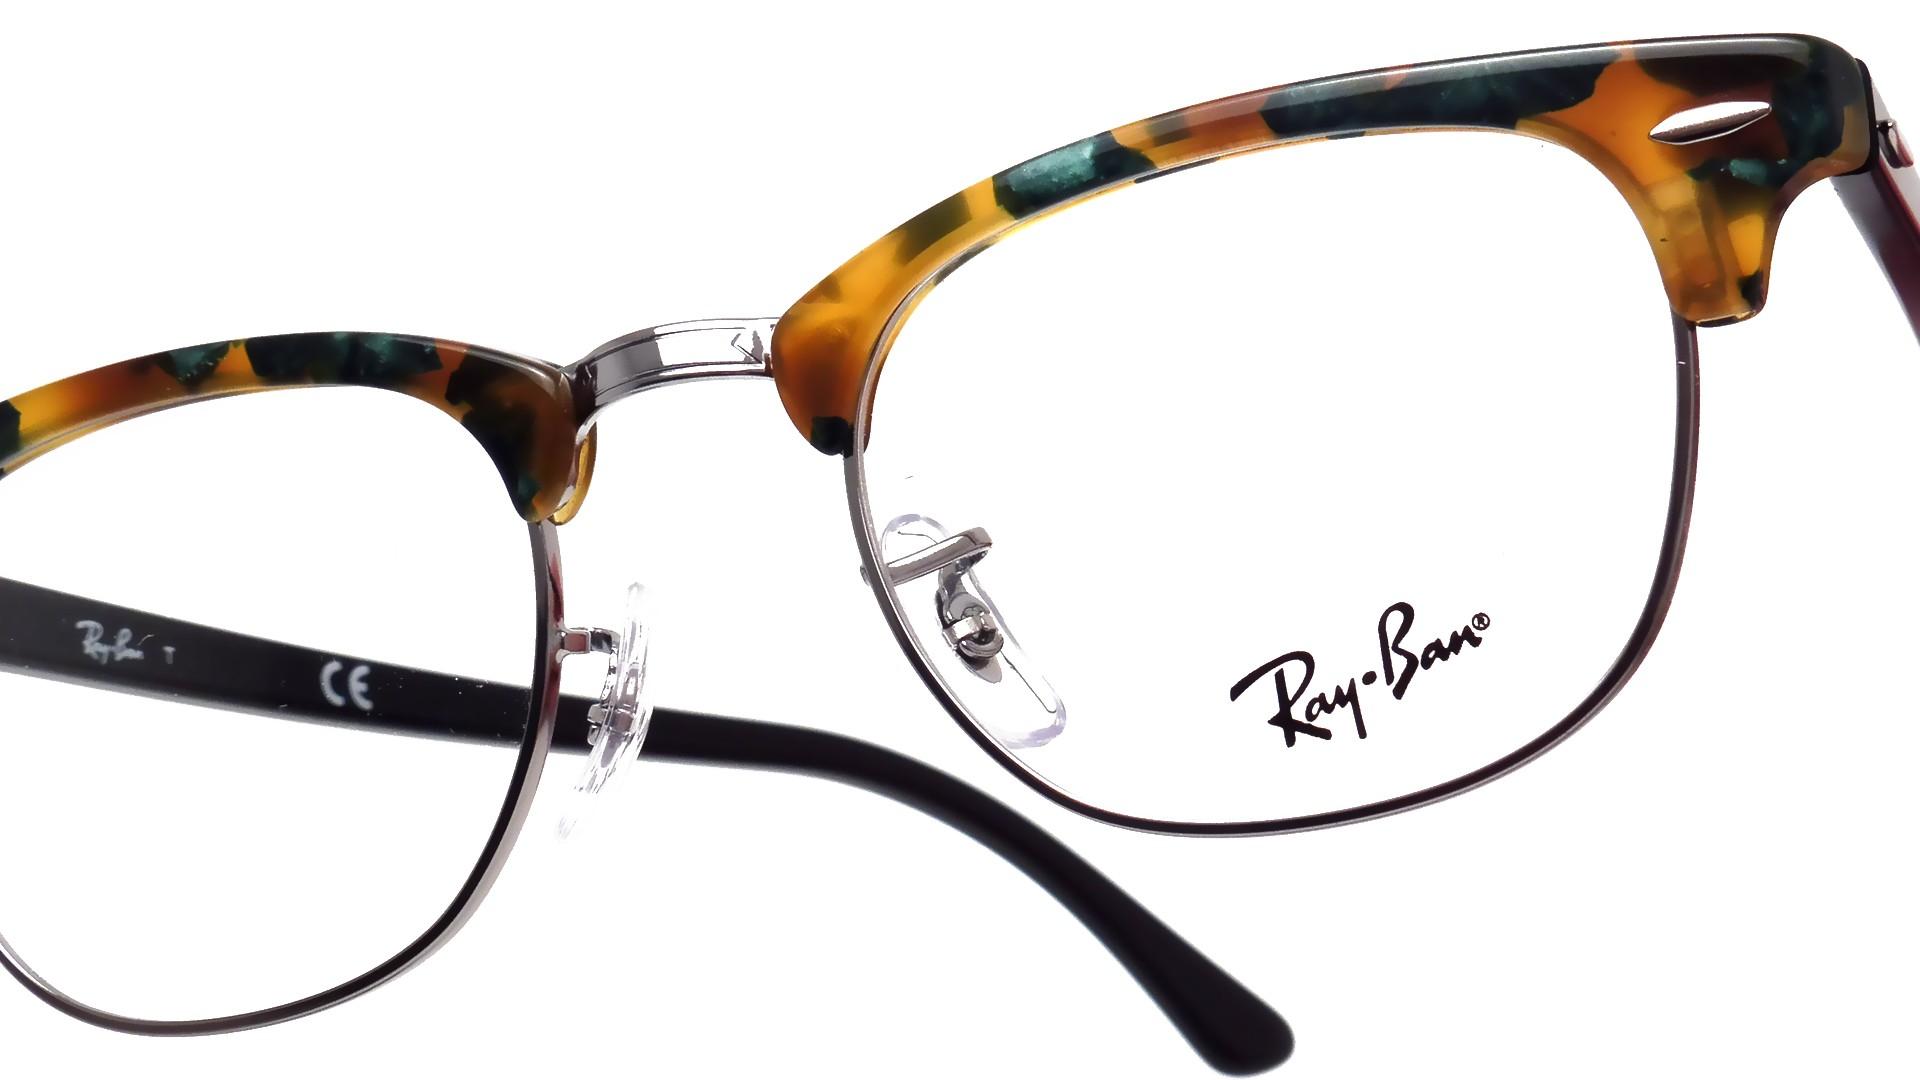 06a1c7f8cc9522 Ray Ban Clubmaster Écaille RX5154 RB5154 5493 49 21